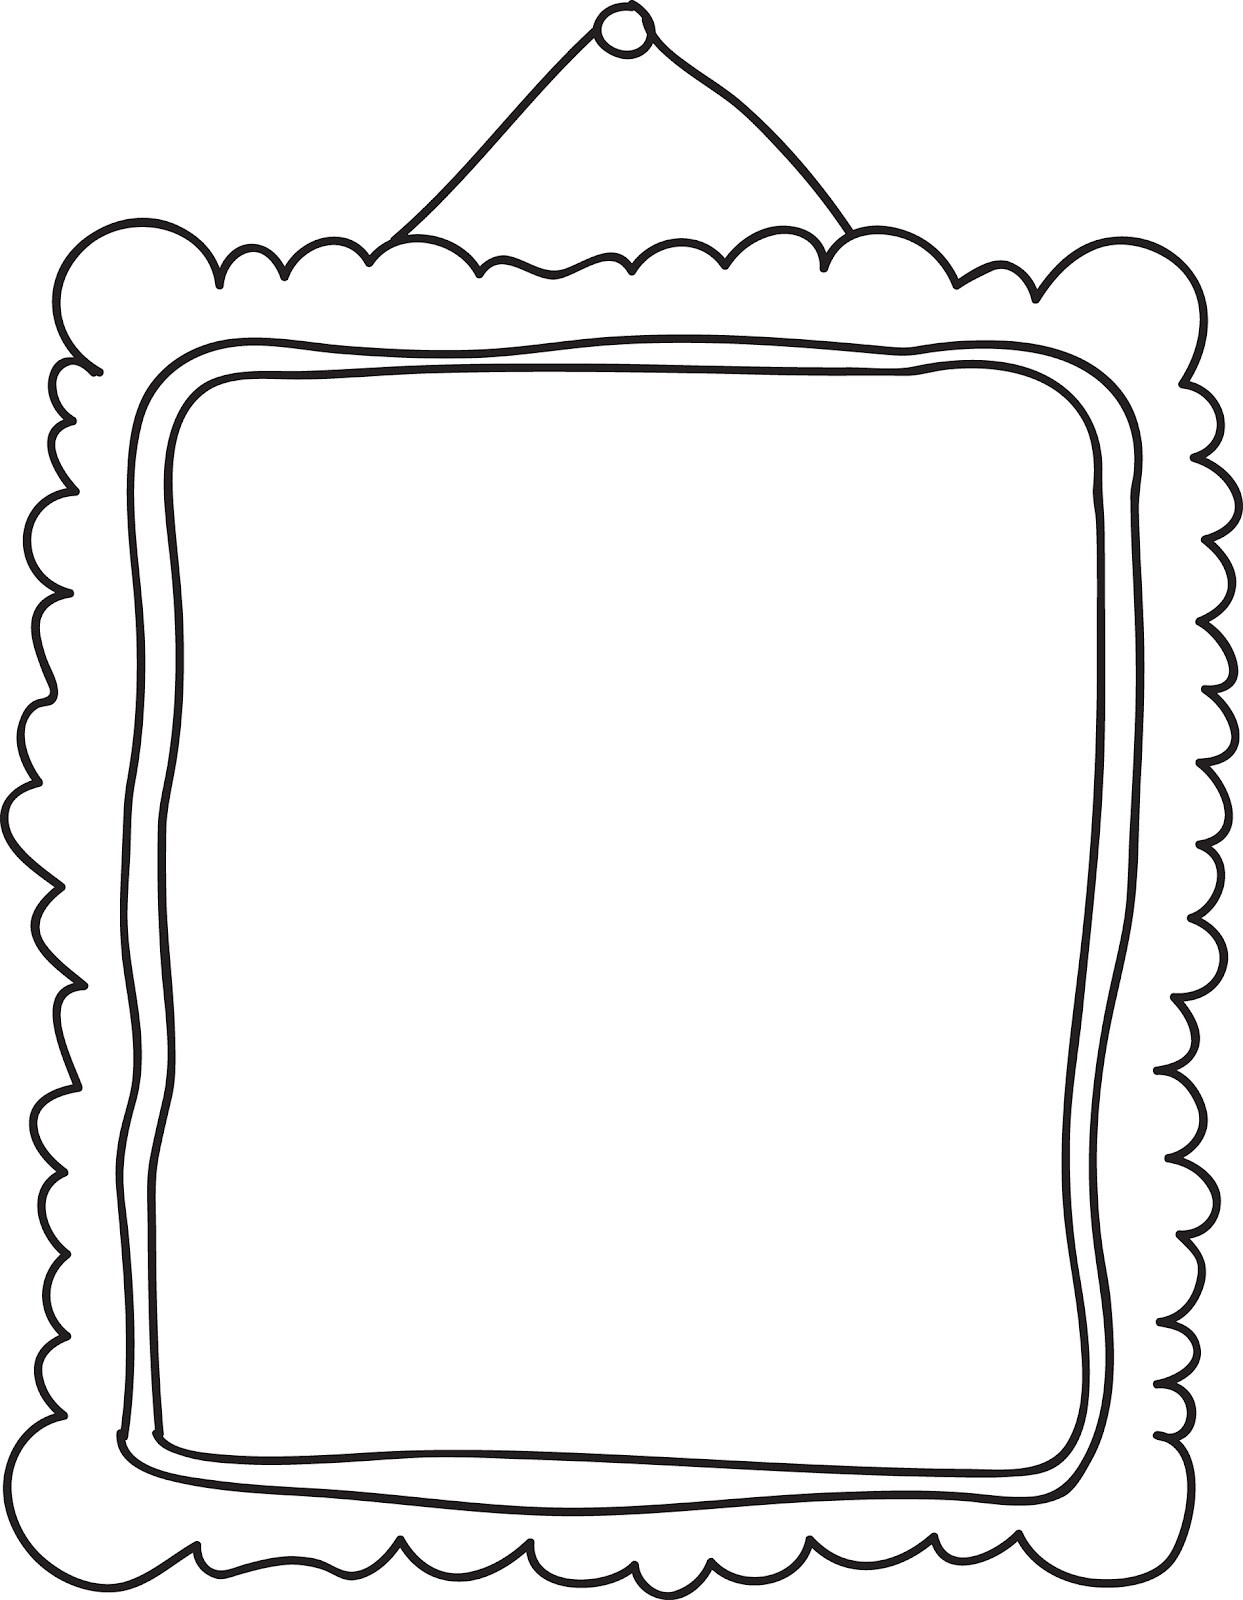 Empty Ten Frame Clipart.